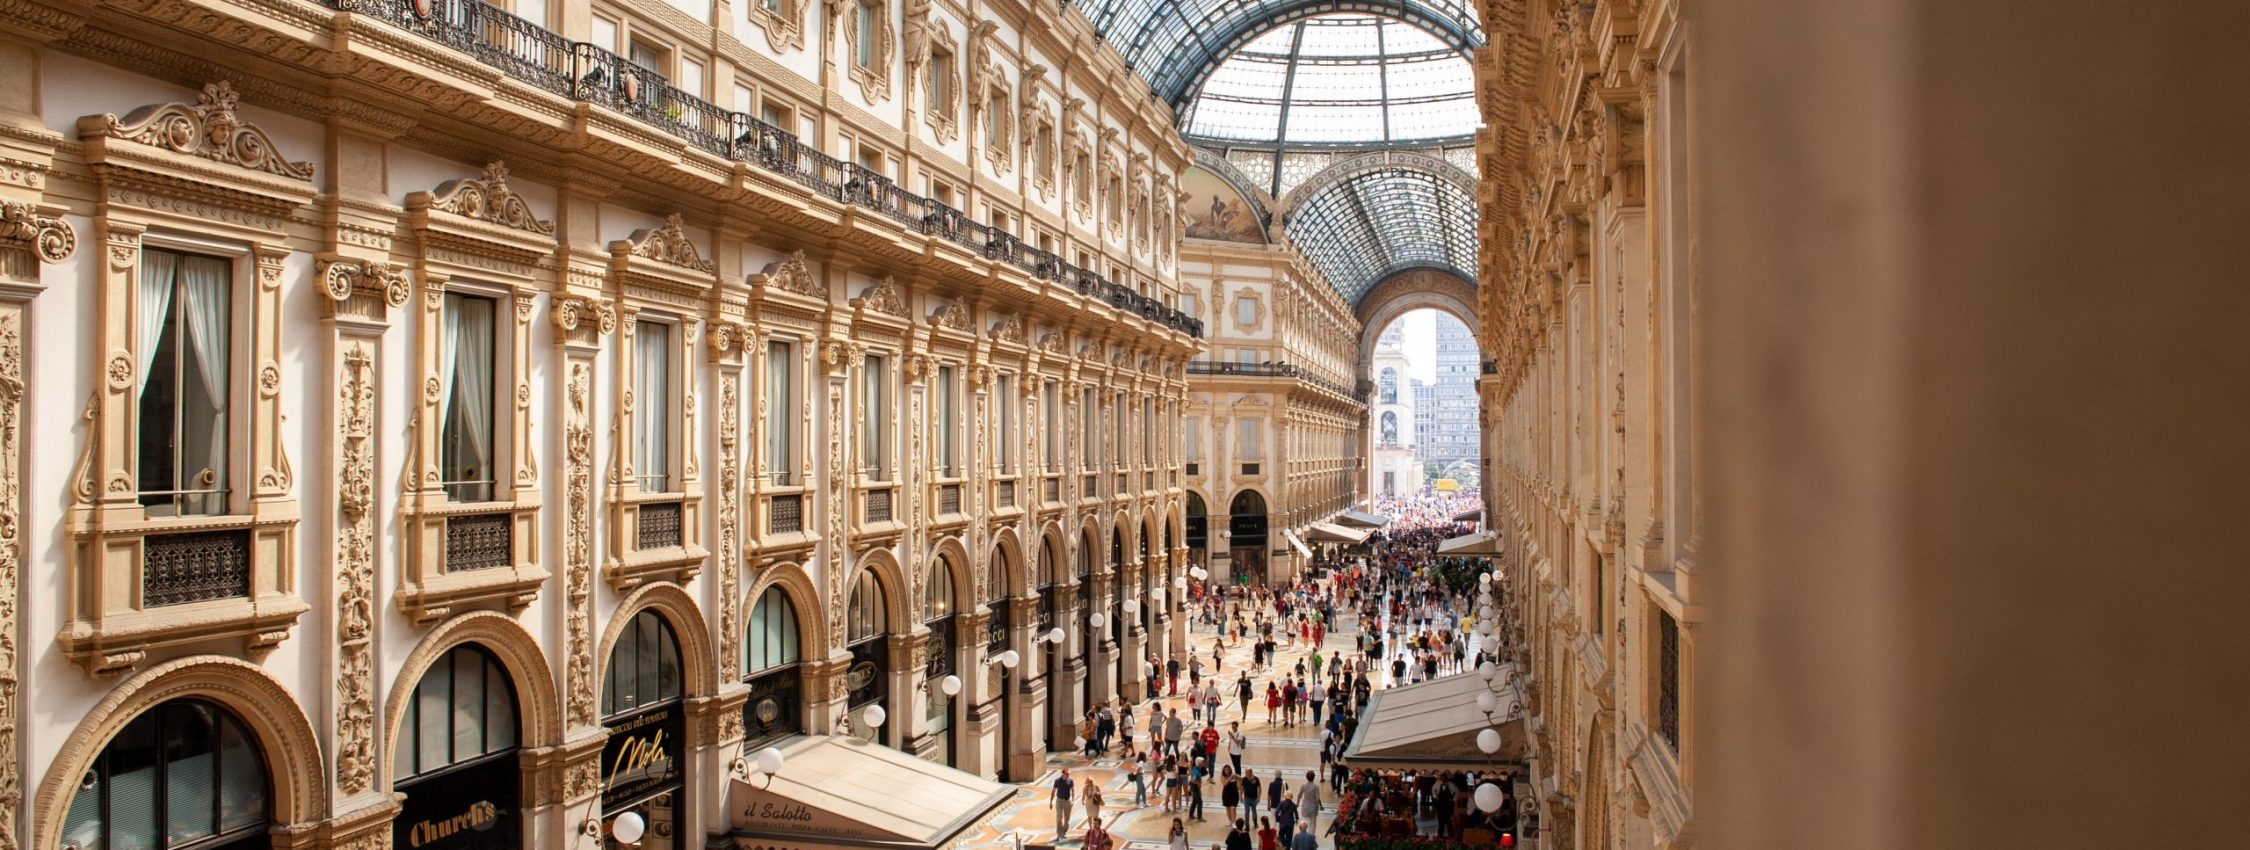 people-inside-galleria-vittorio-emanuele-ii-shopping-mall-in-2954412